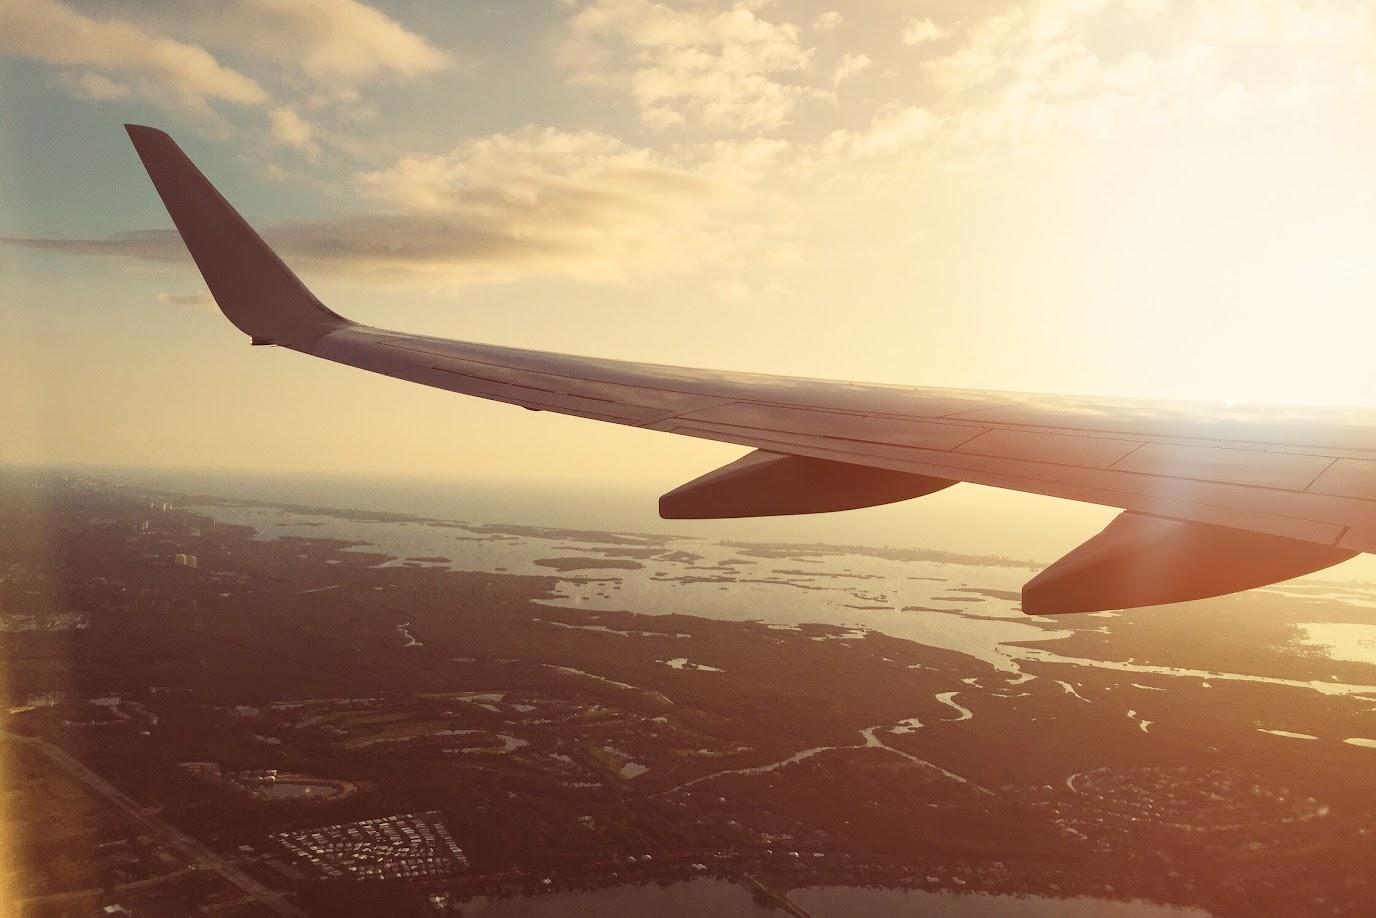 Qatar Airwaysin lentodiilit